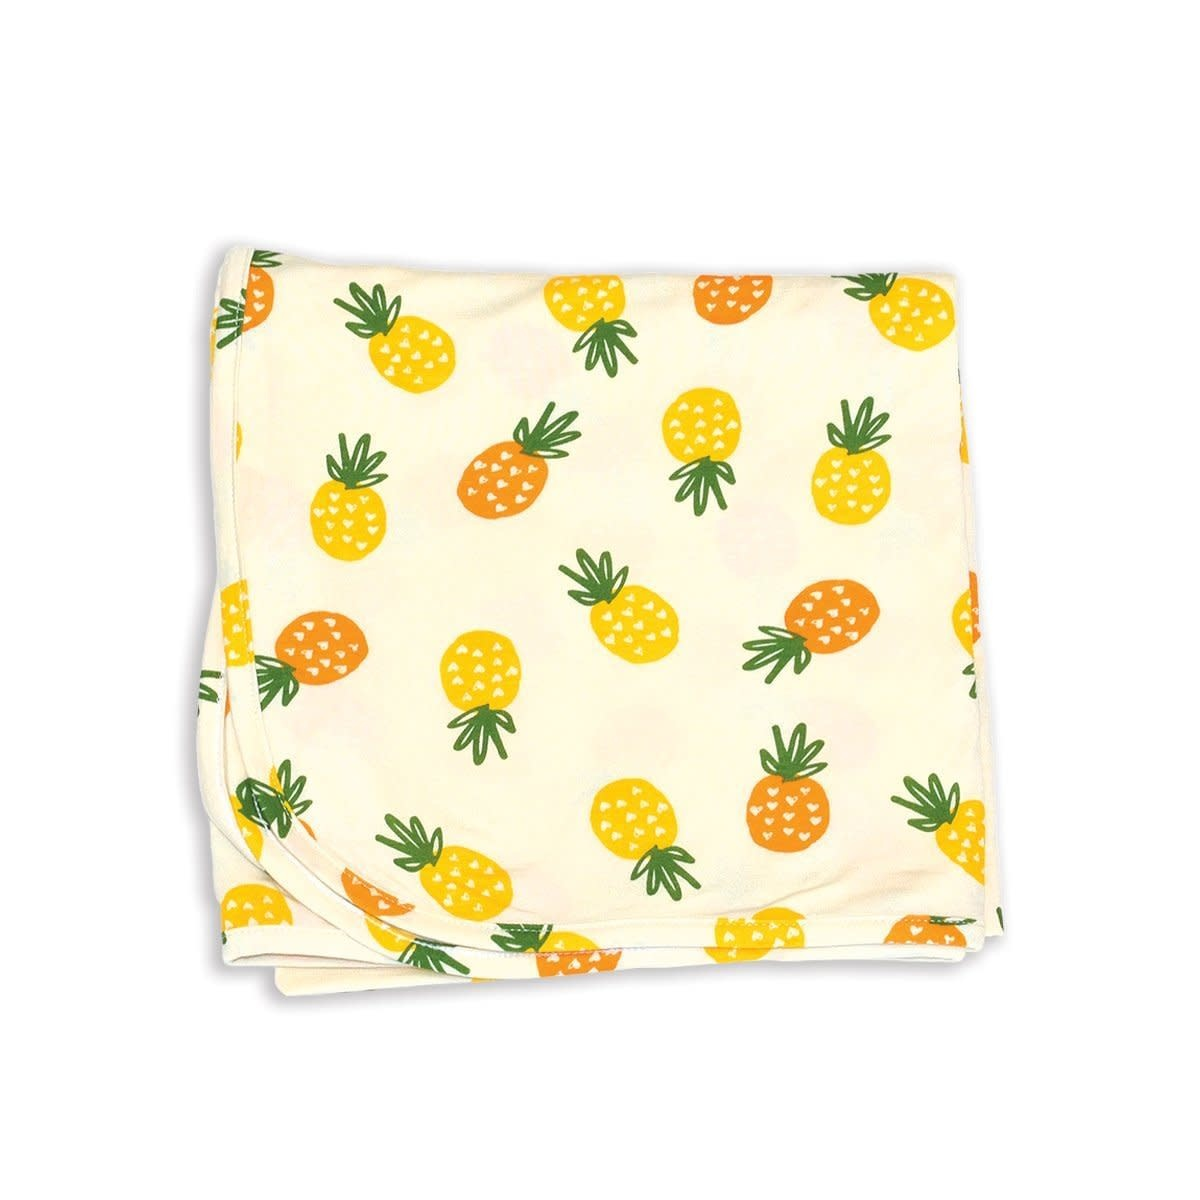 Bamboo Swaddle Blanket - Pineapple Love